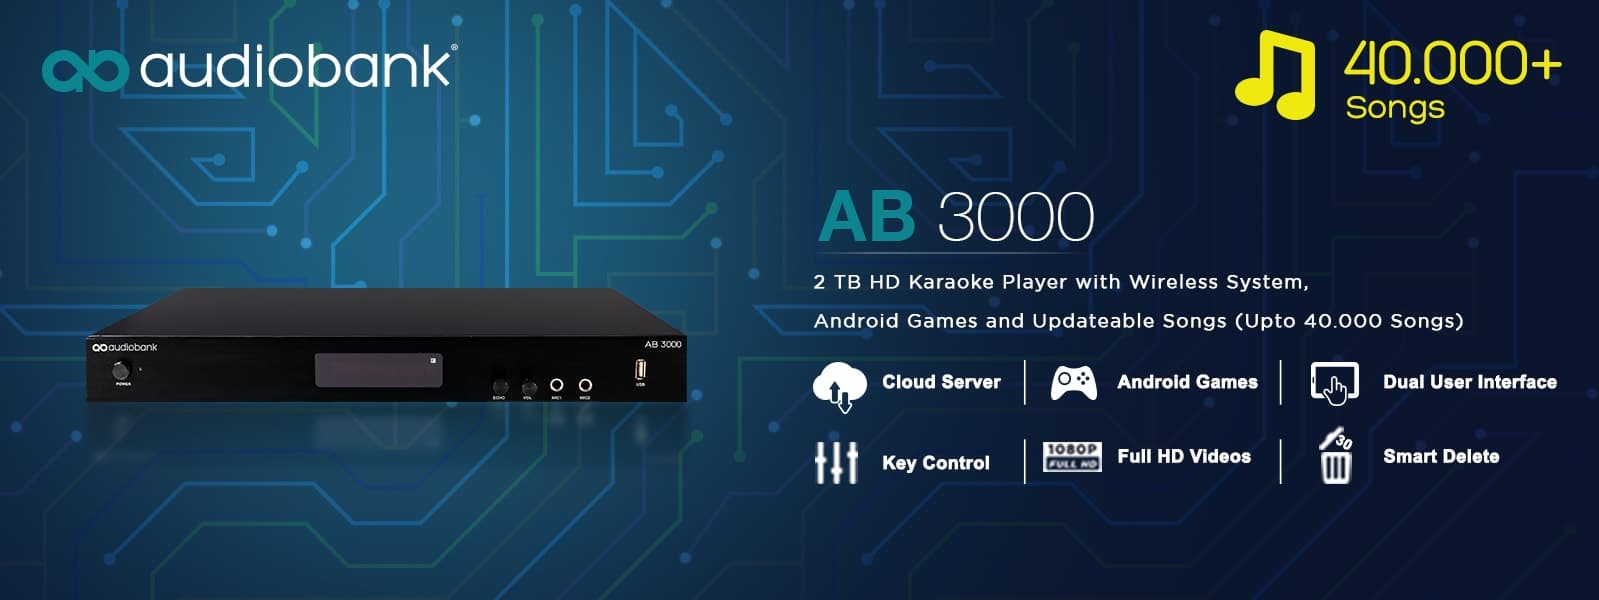 Bless Audio-Audiobank AB 3000 + Hdd 4 Tera( 70.000 Lagu)+ LCD Monitor Audiobank Tc 100 - Blanja.com